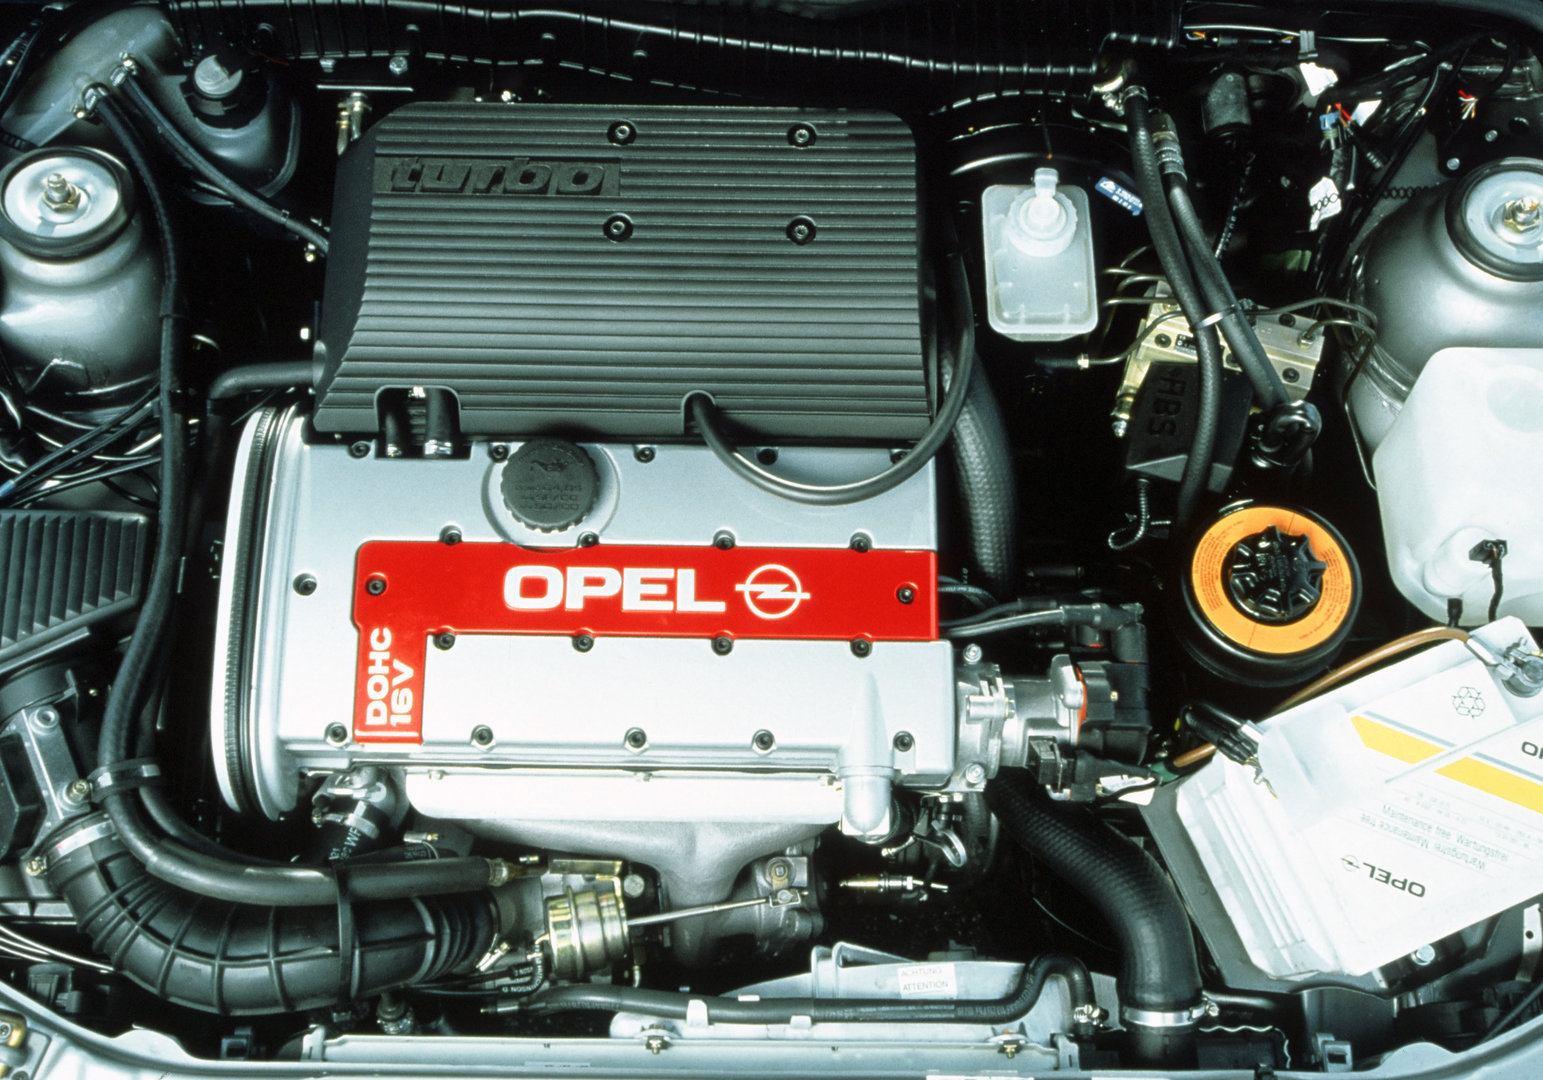 Opel Vectra A Turbo 4x4 4